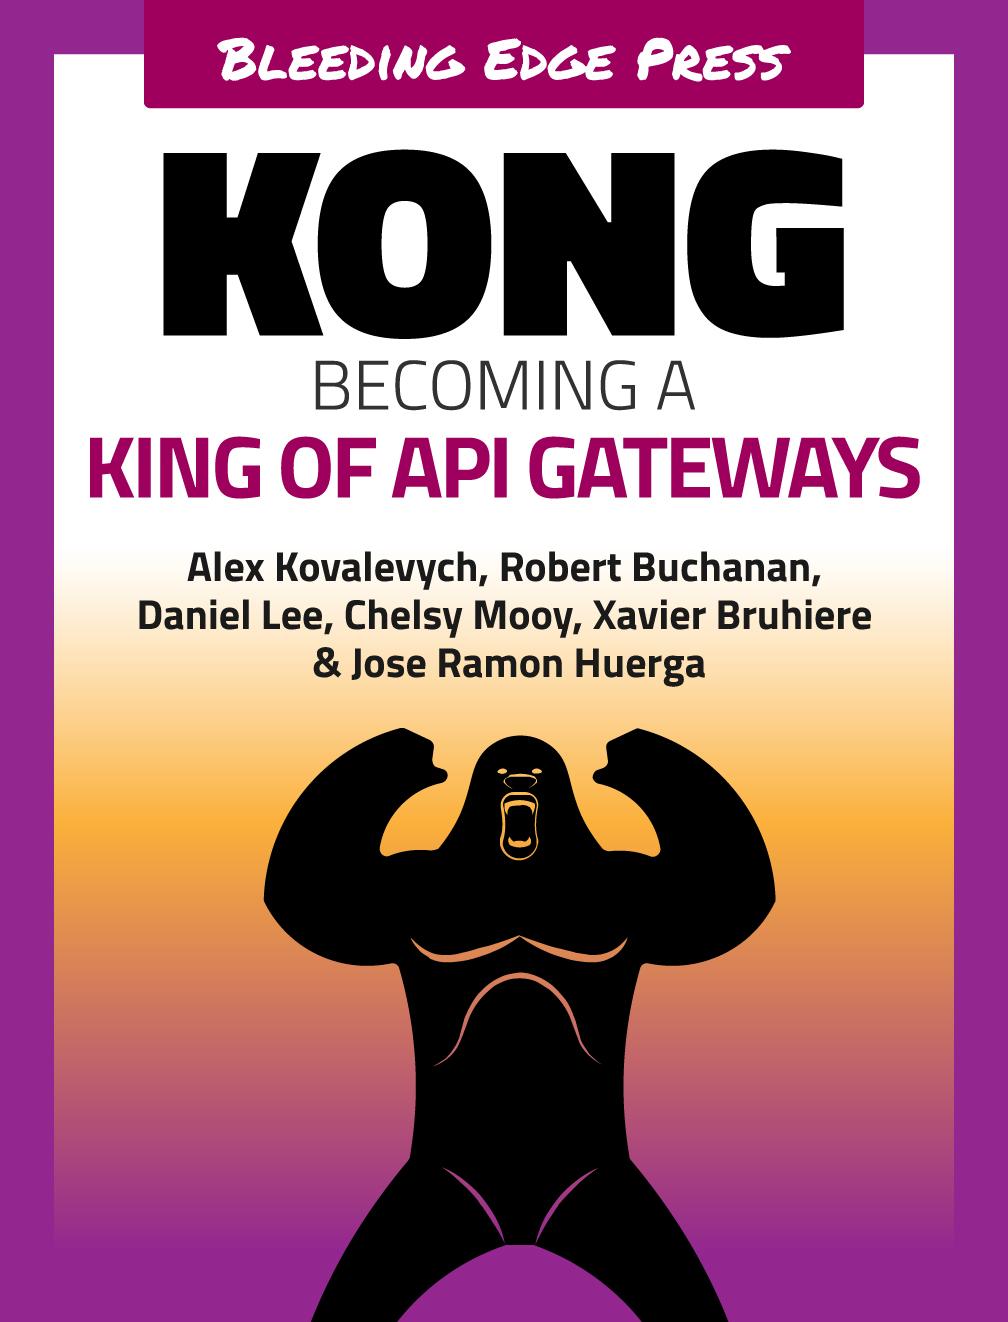 Kong - Becoming a King of API Gateways